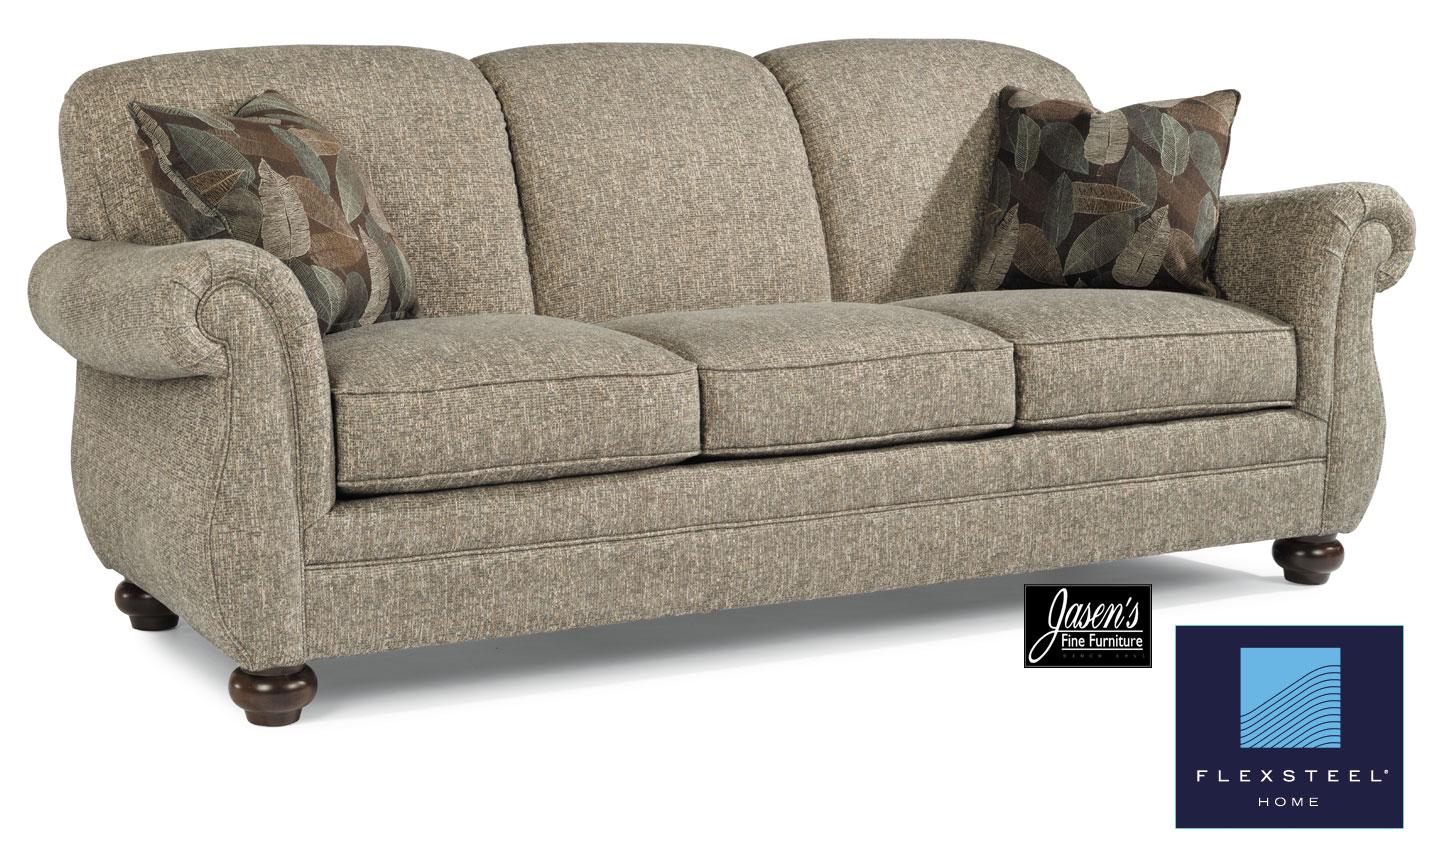 Flexsteel Winston Jasen 39 S Fine Furniture Since 1951